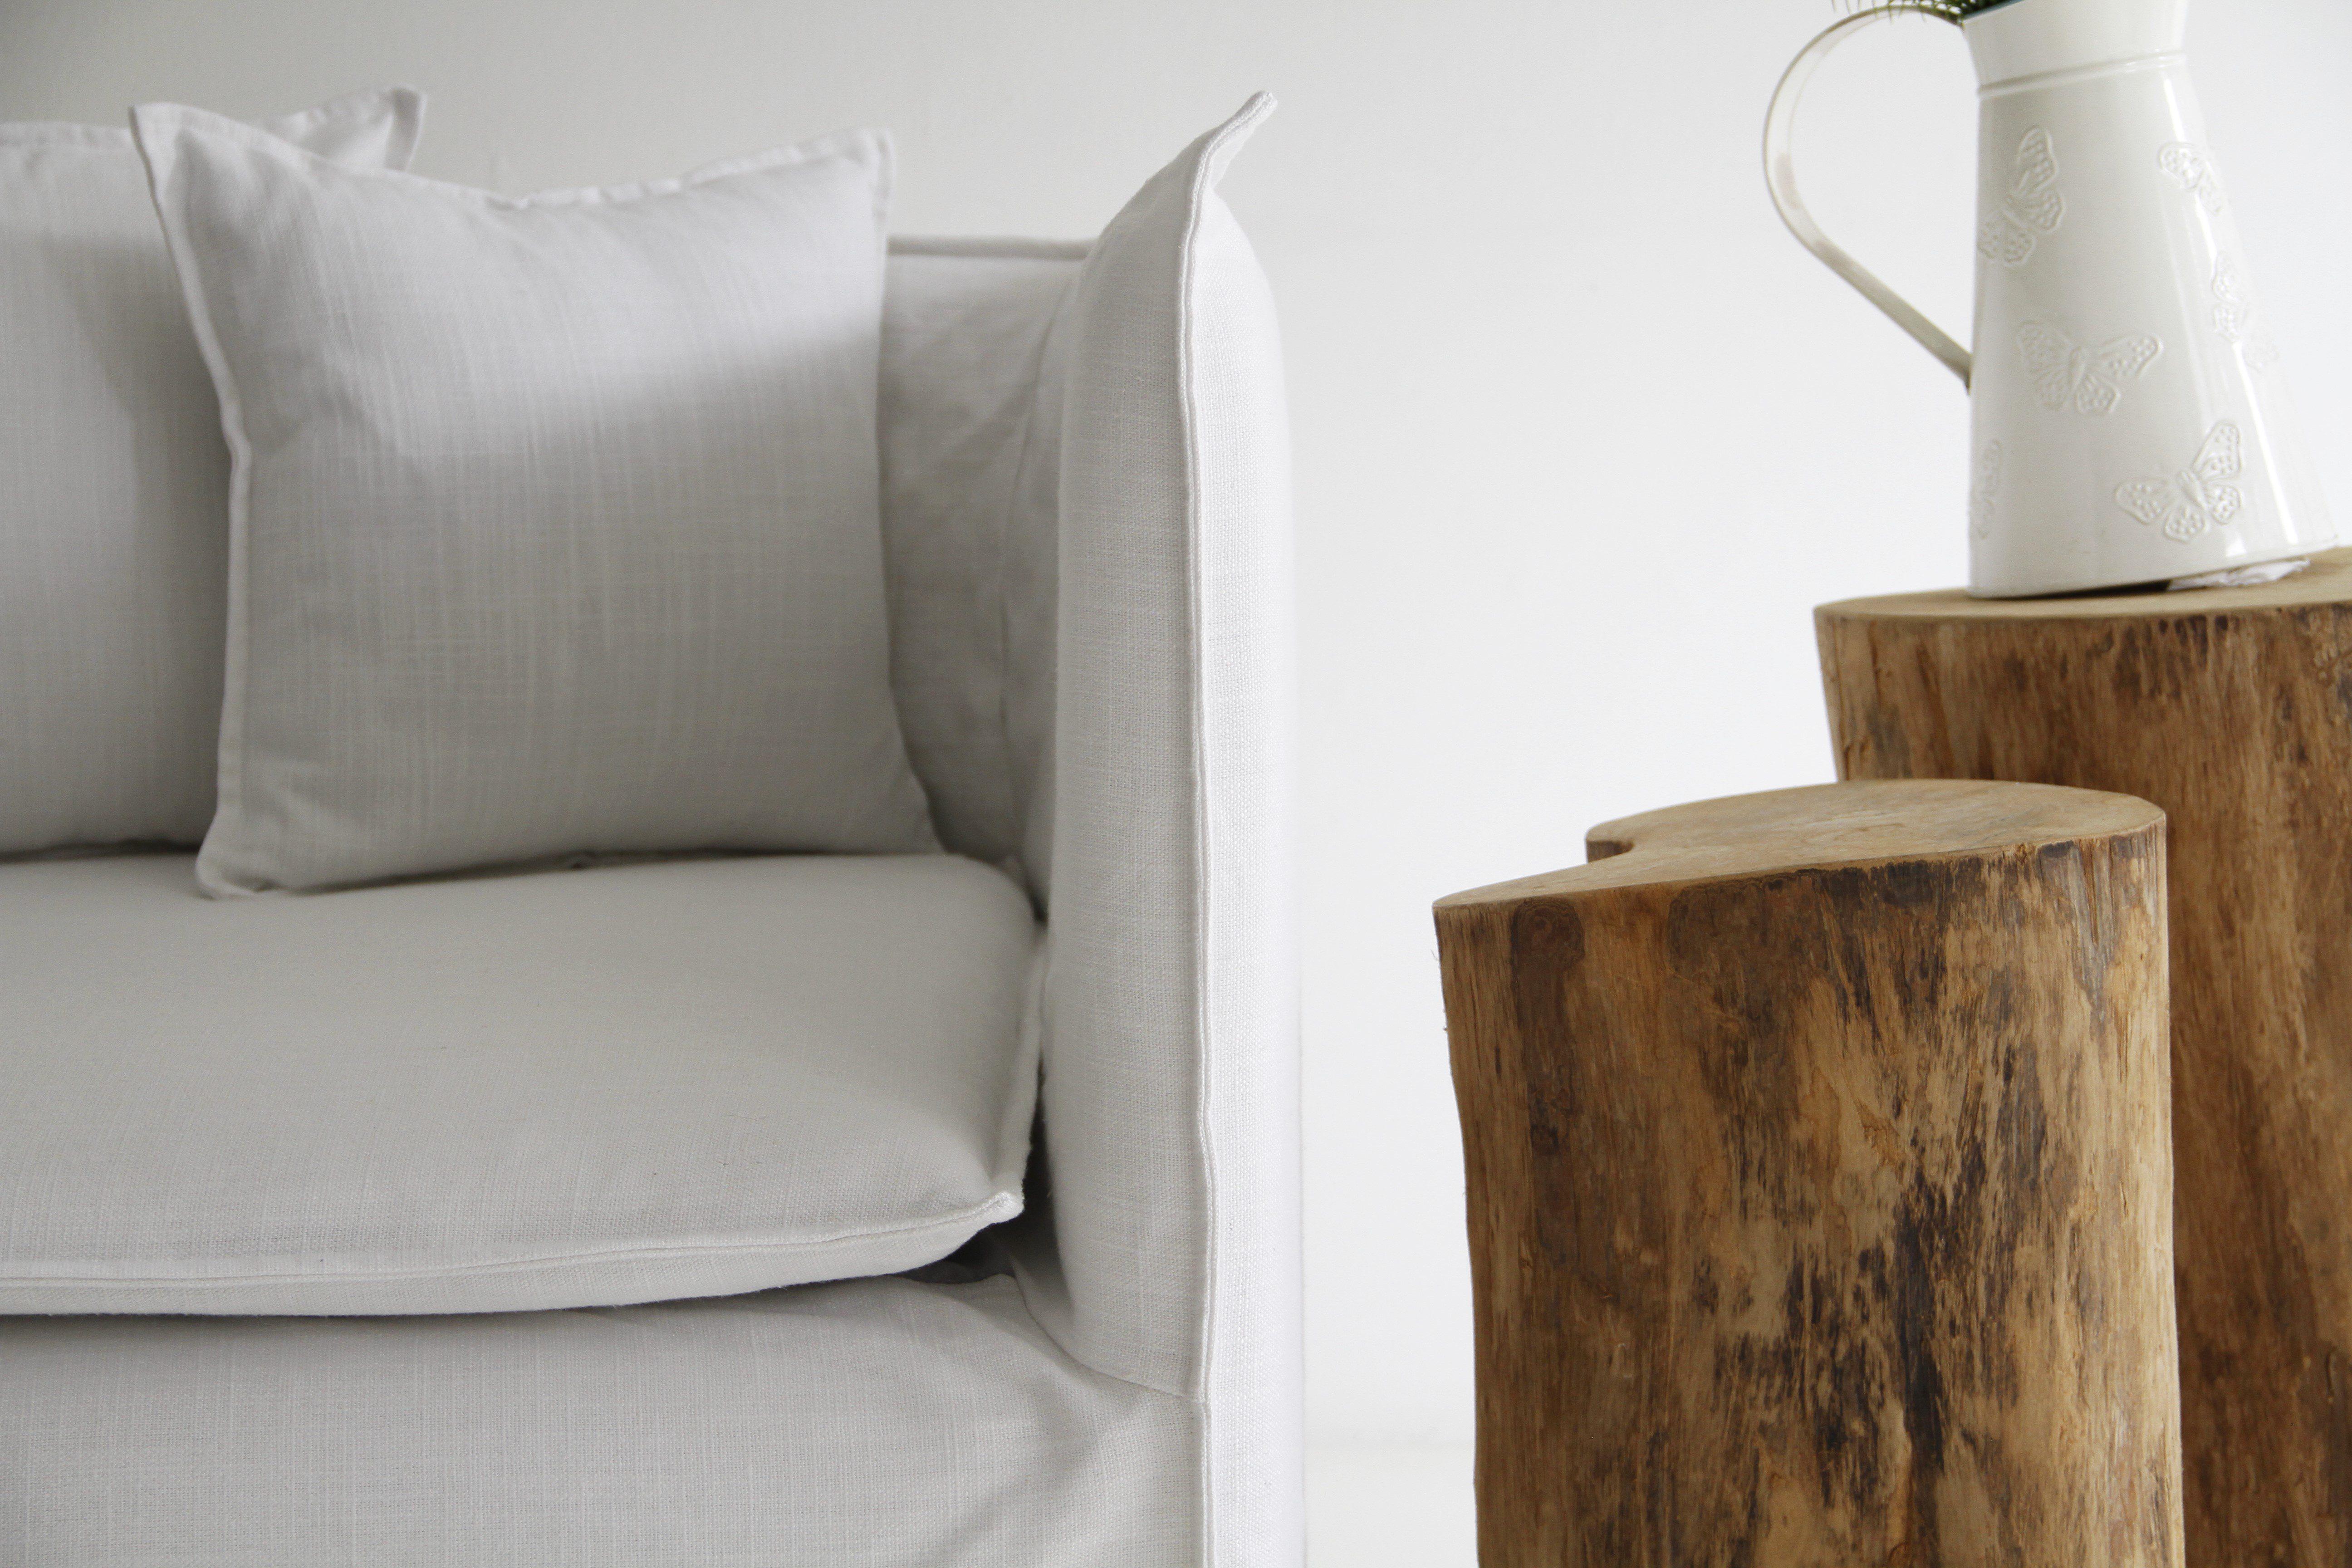 Ghost Sofa hack on the Ikea Soderhamn sofa - custom slipcovers